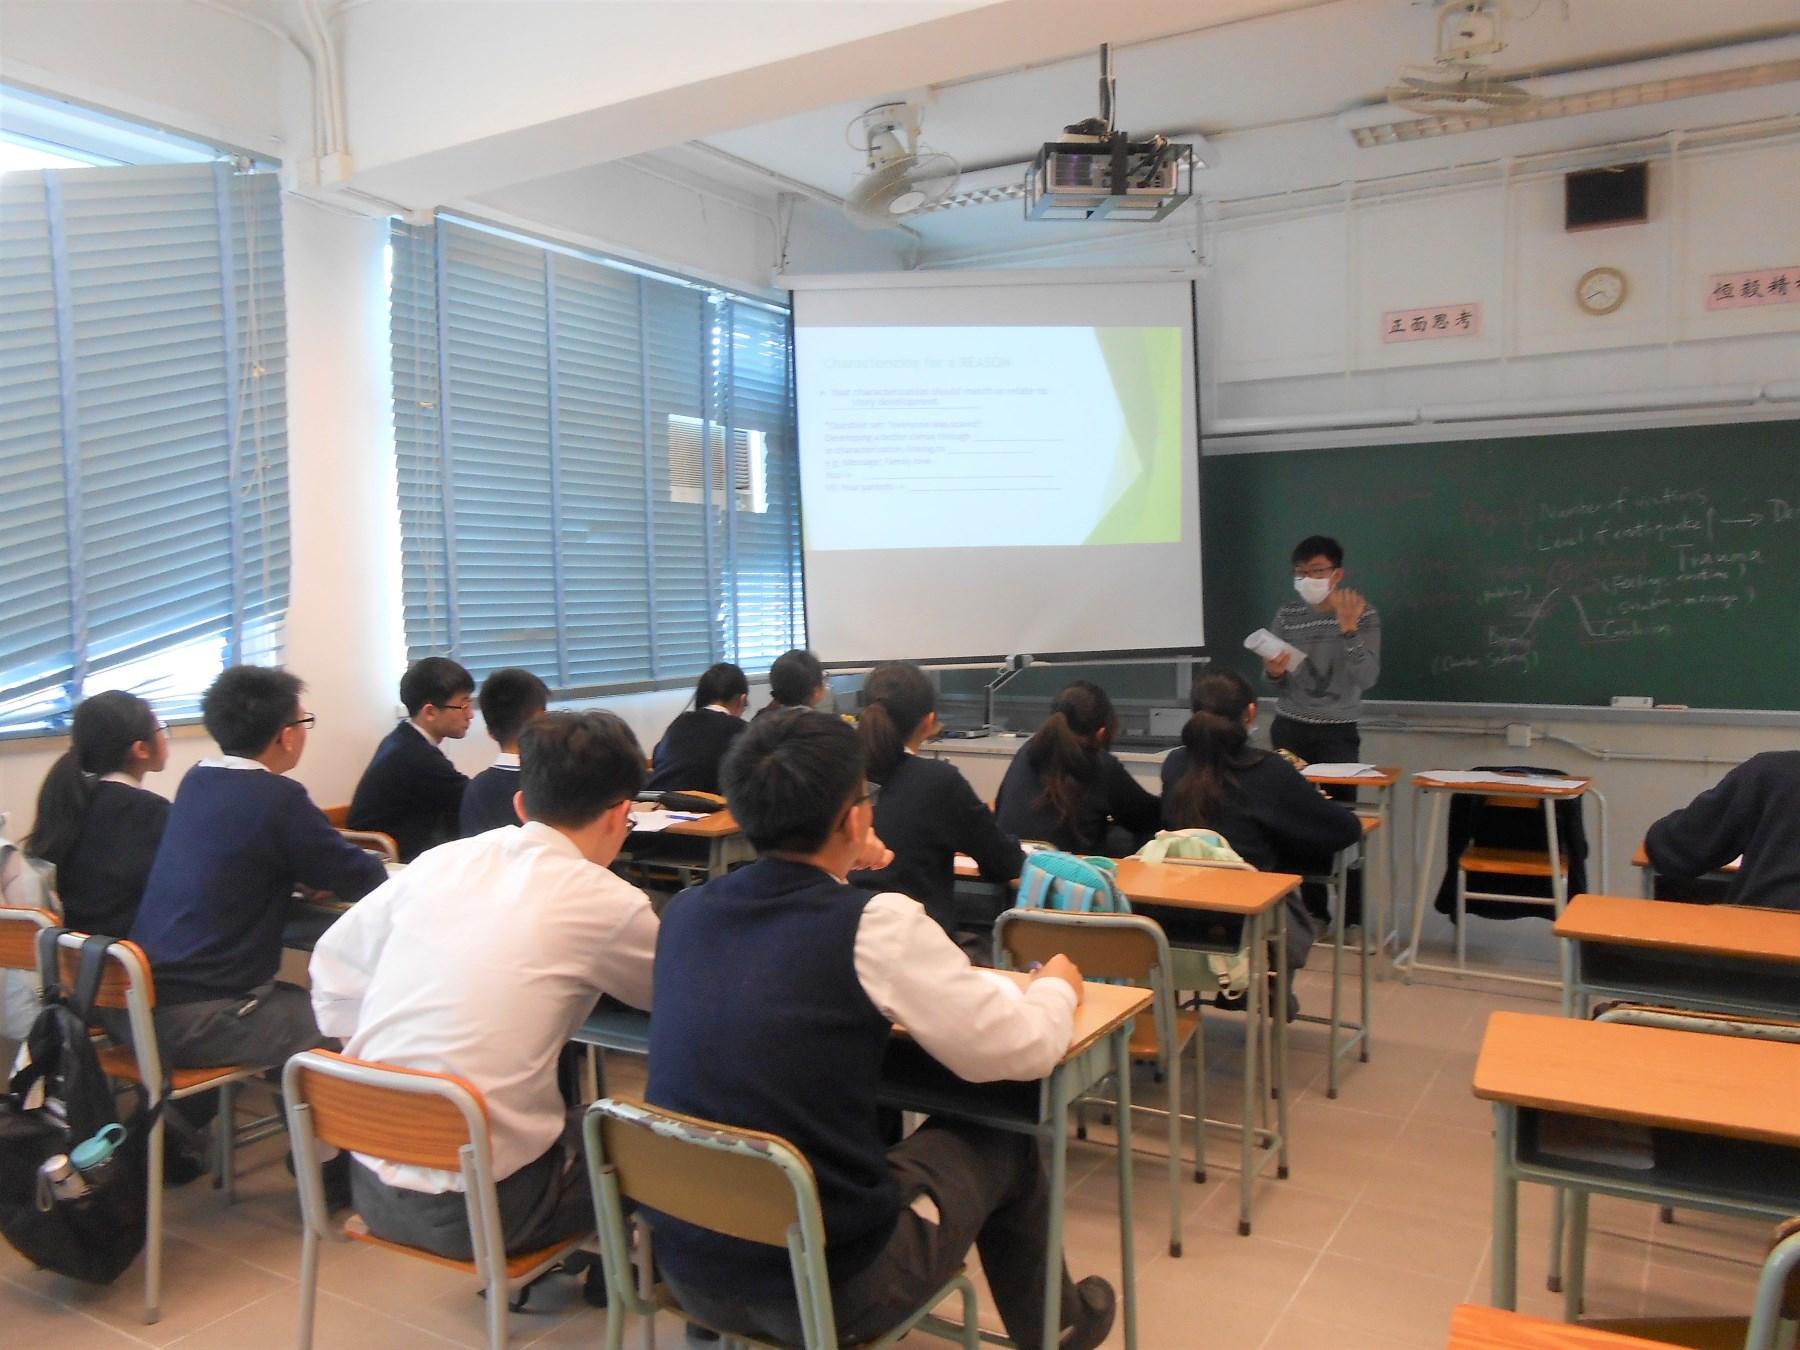 http://npc.edu.hk/sites/default/files/dscn9817.jpg